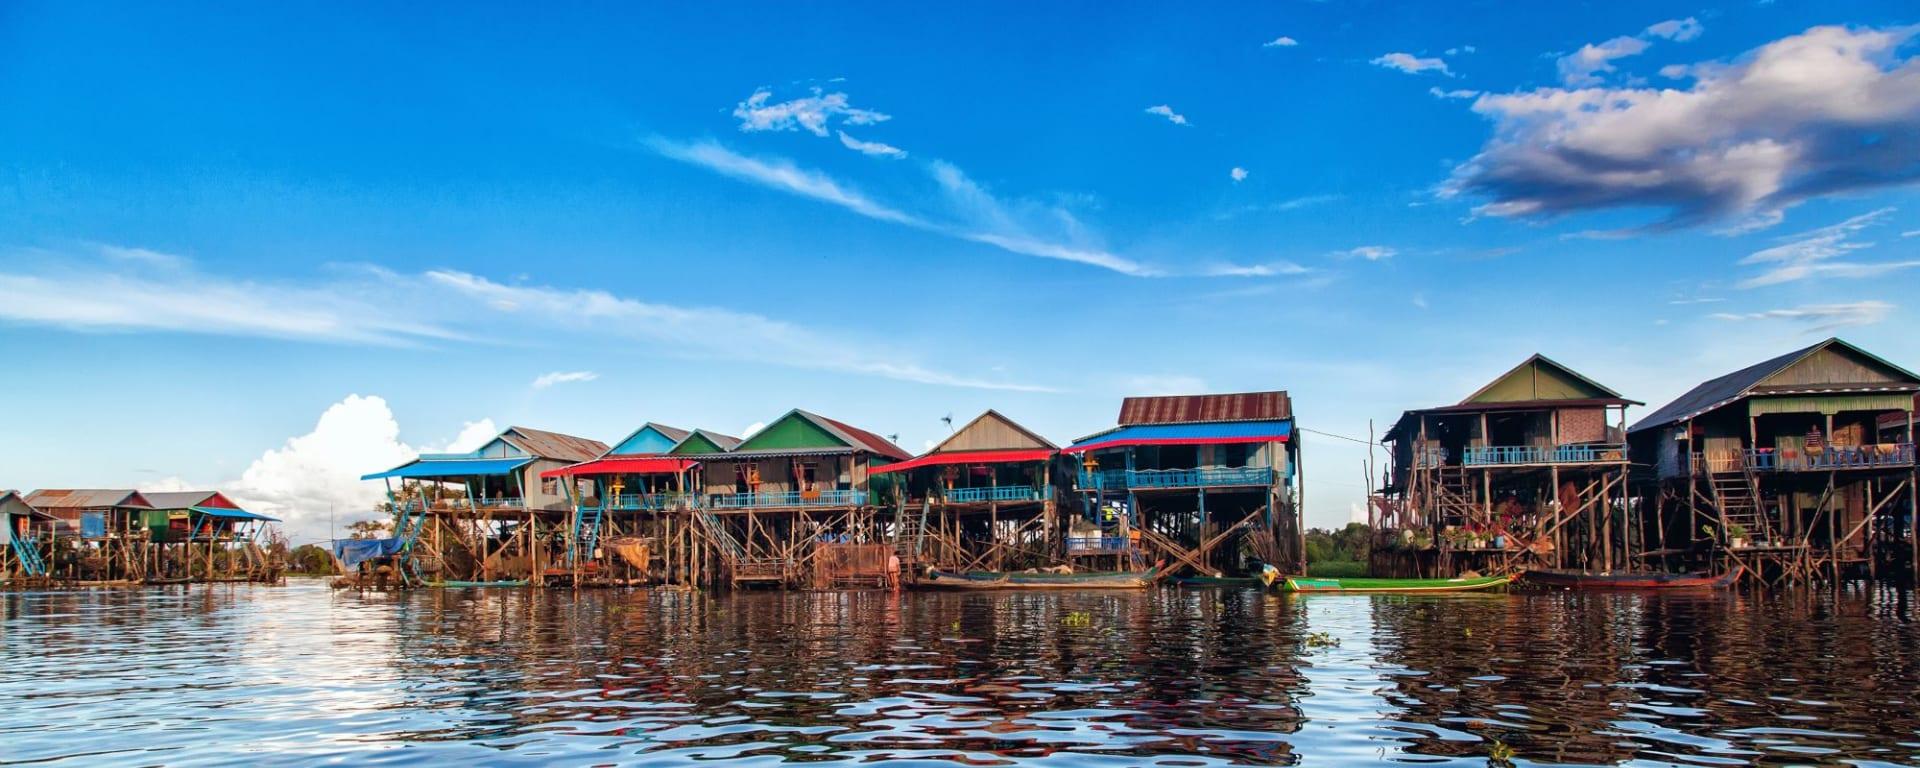 Battambang - Die Reiskammer Kambodschas (Siem Reap - Ko Chang): Tonle Sap Floating Village